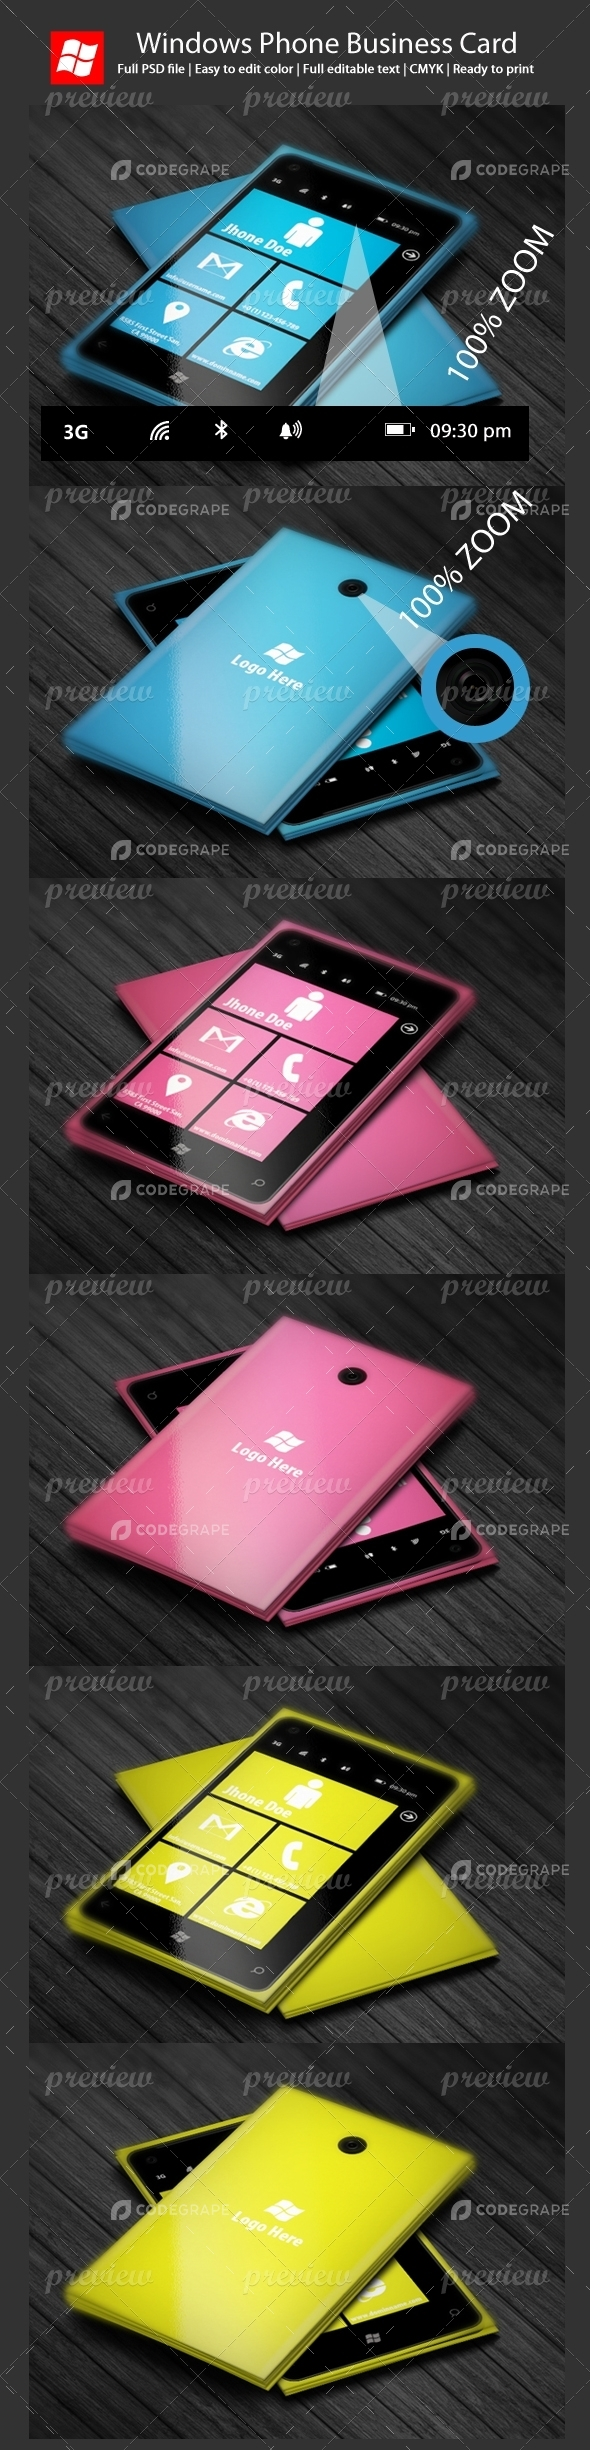 Windows Phone Business Card